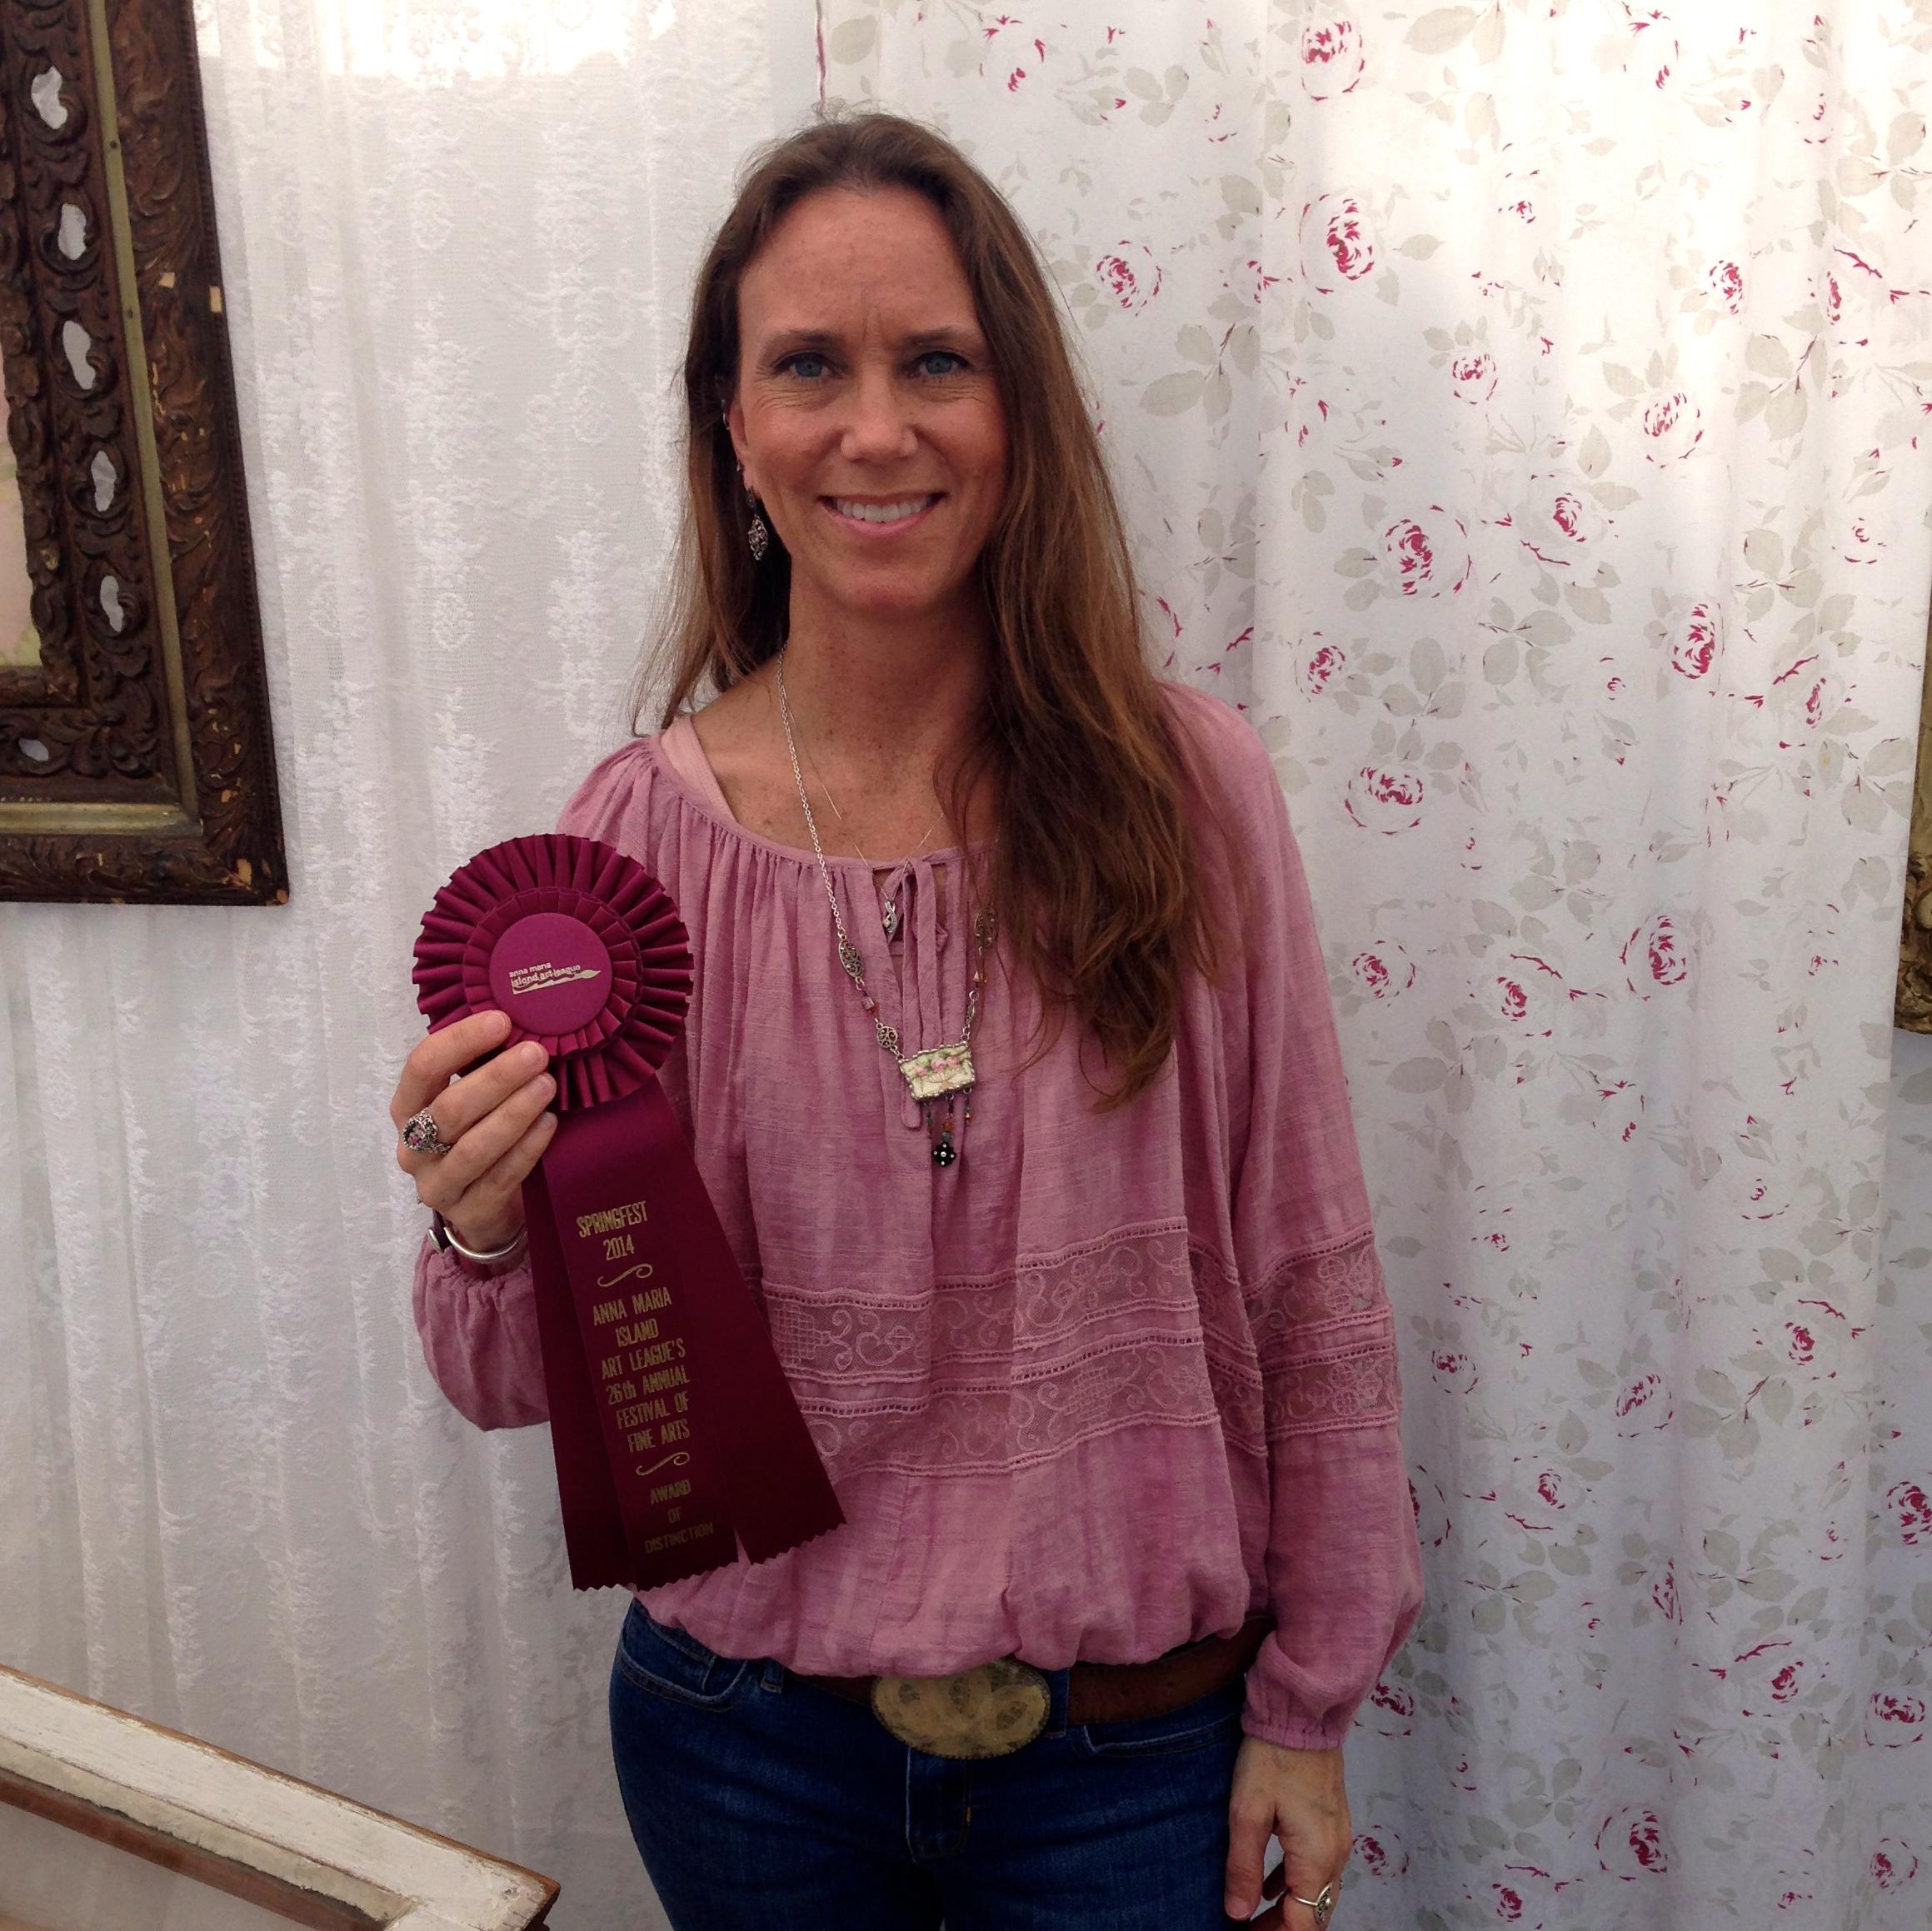 Won the Award of Distinction @ Anna Maria Island Art League's Festival of the Arts March 2014.